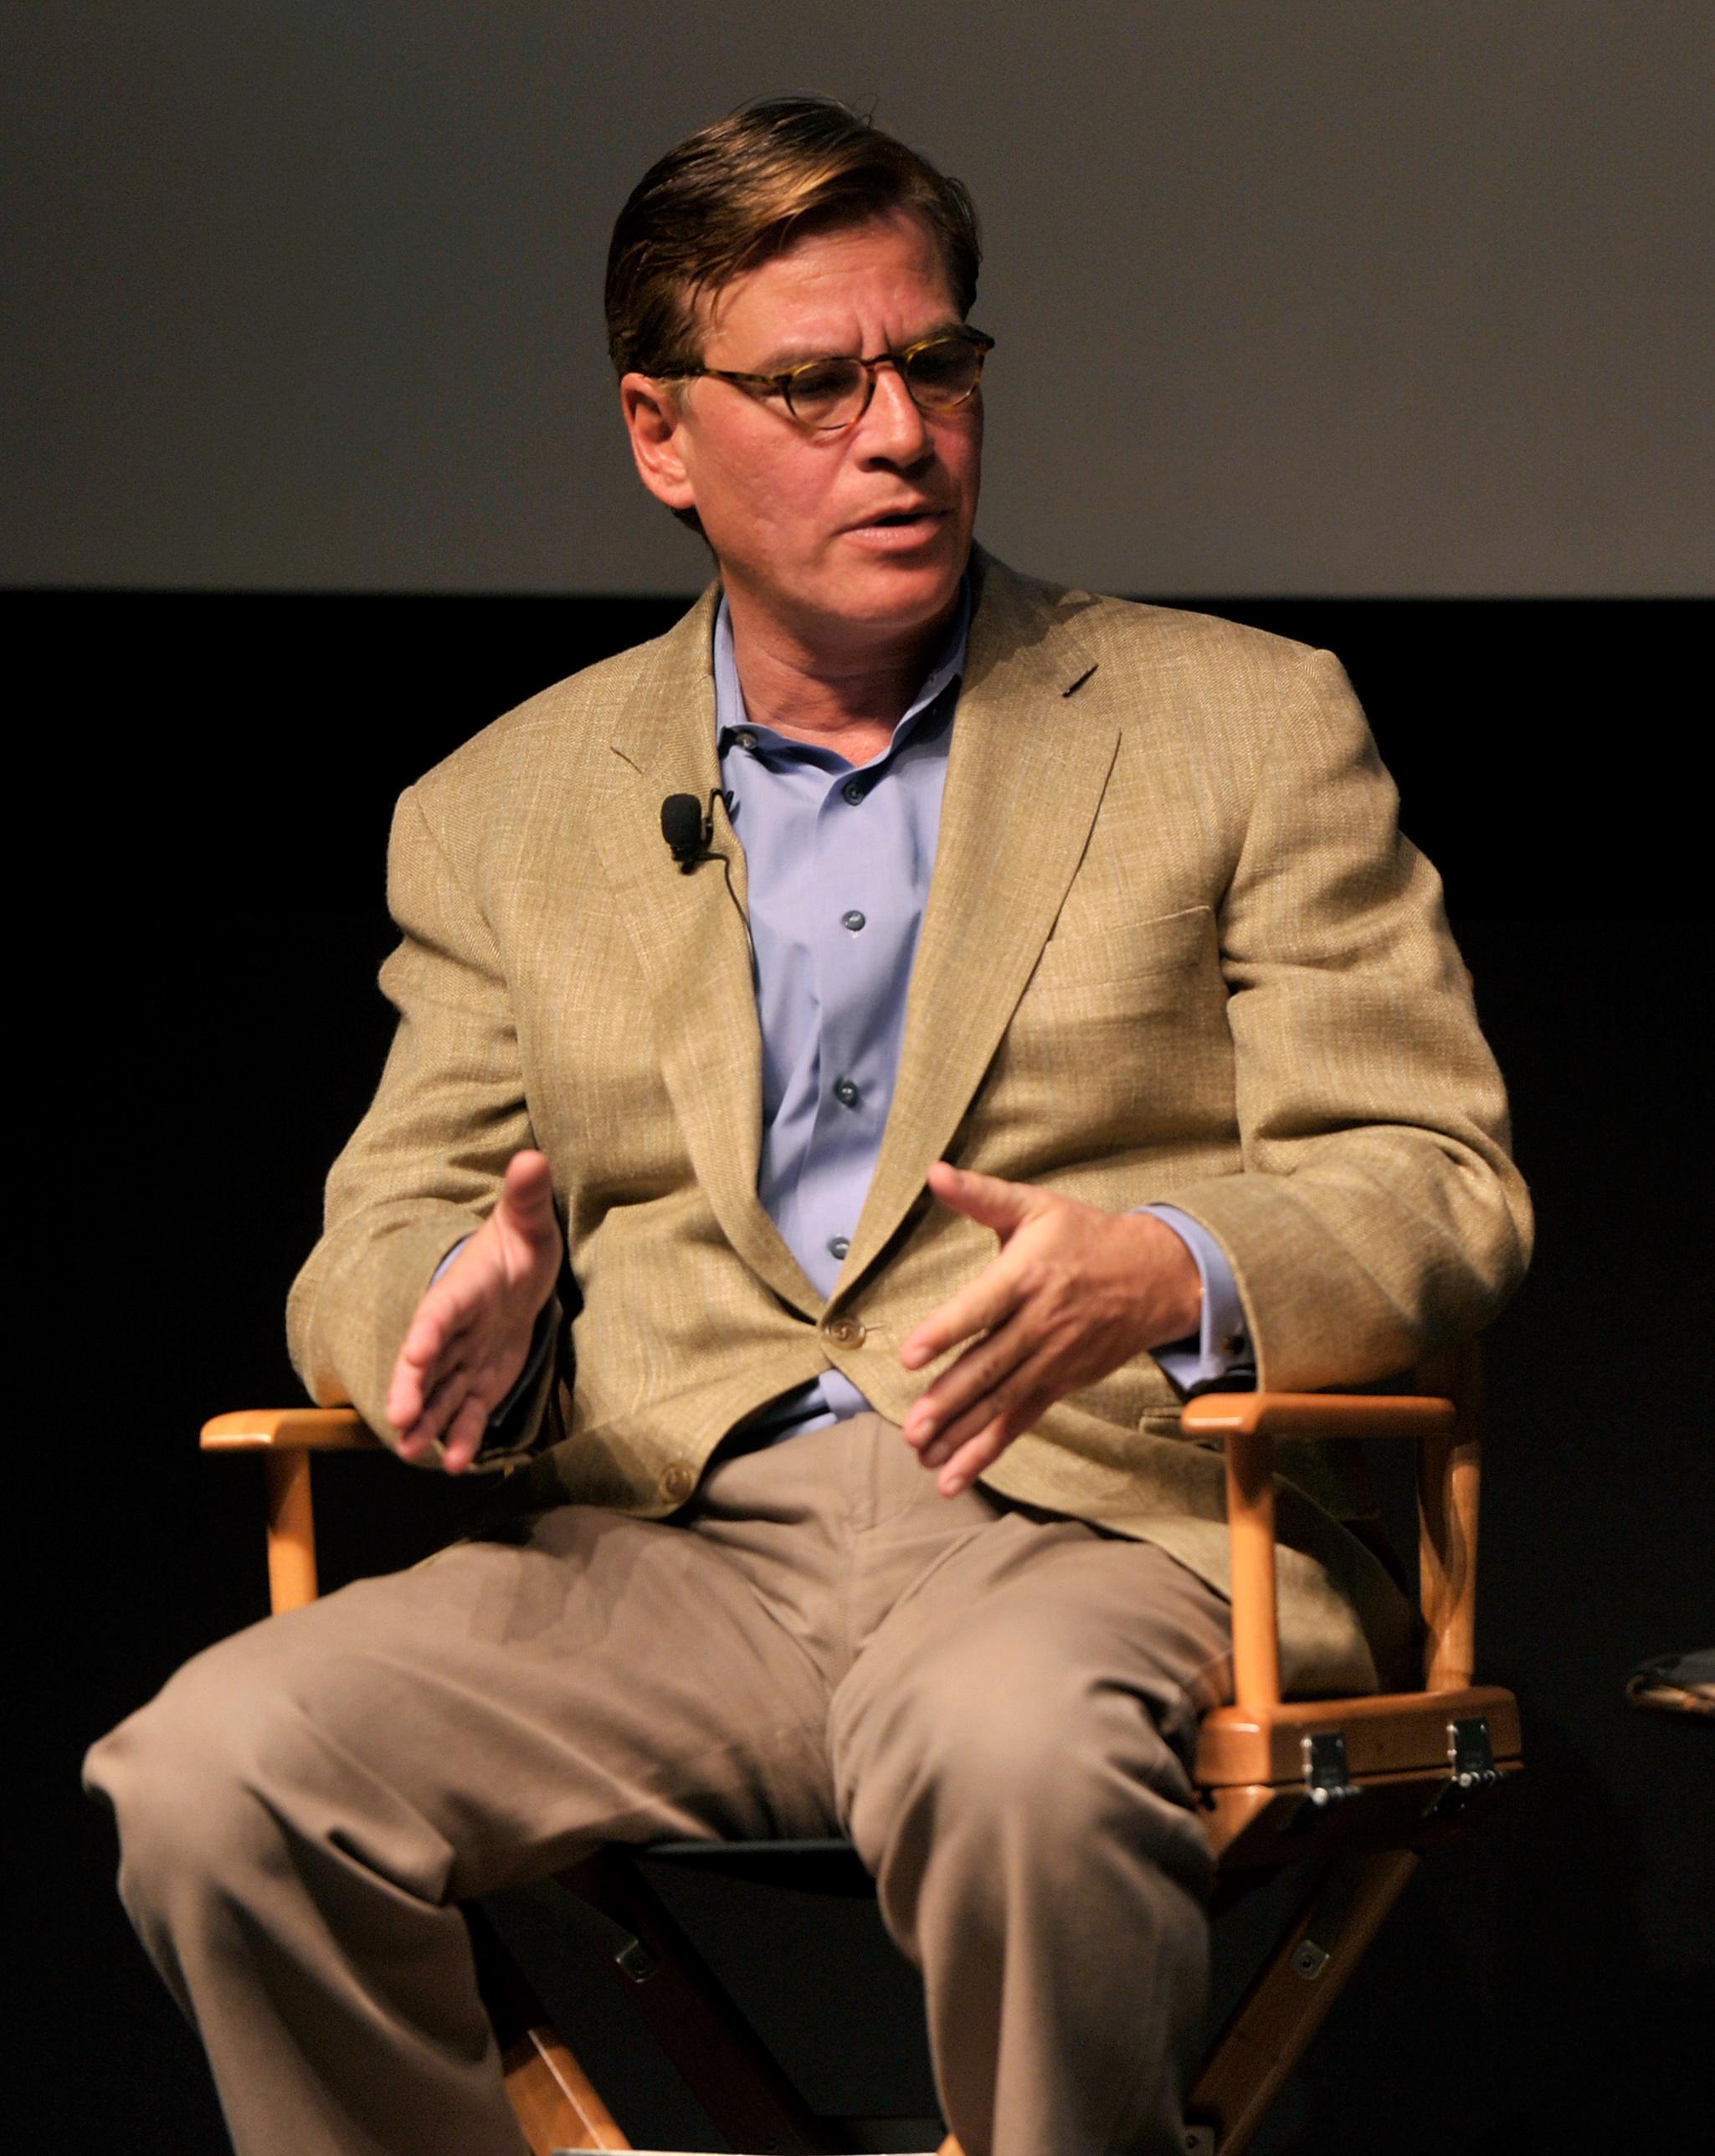 Mr. Sorkin onstage last night. (Photo: Getty)